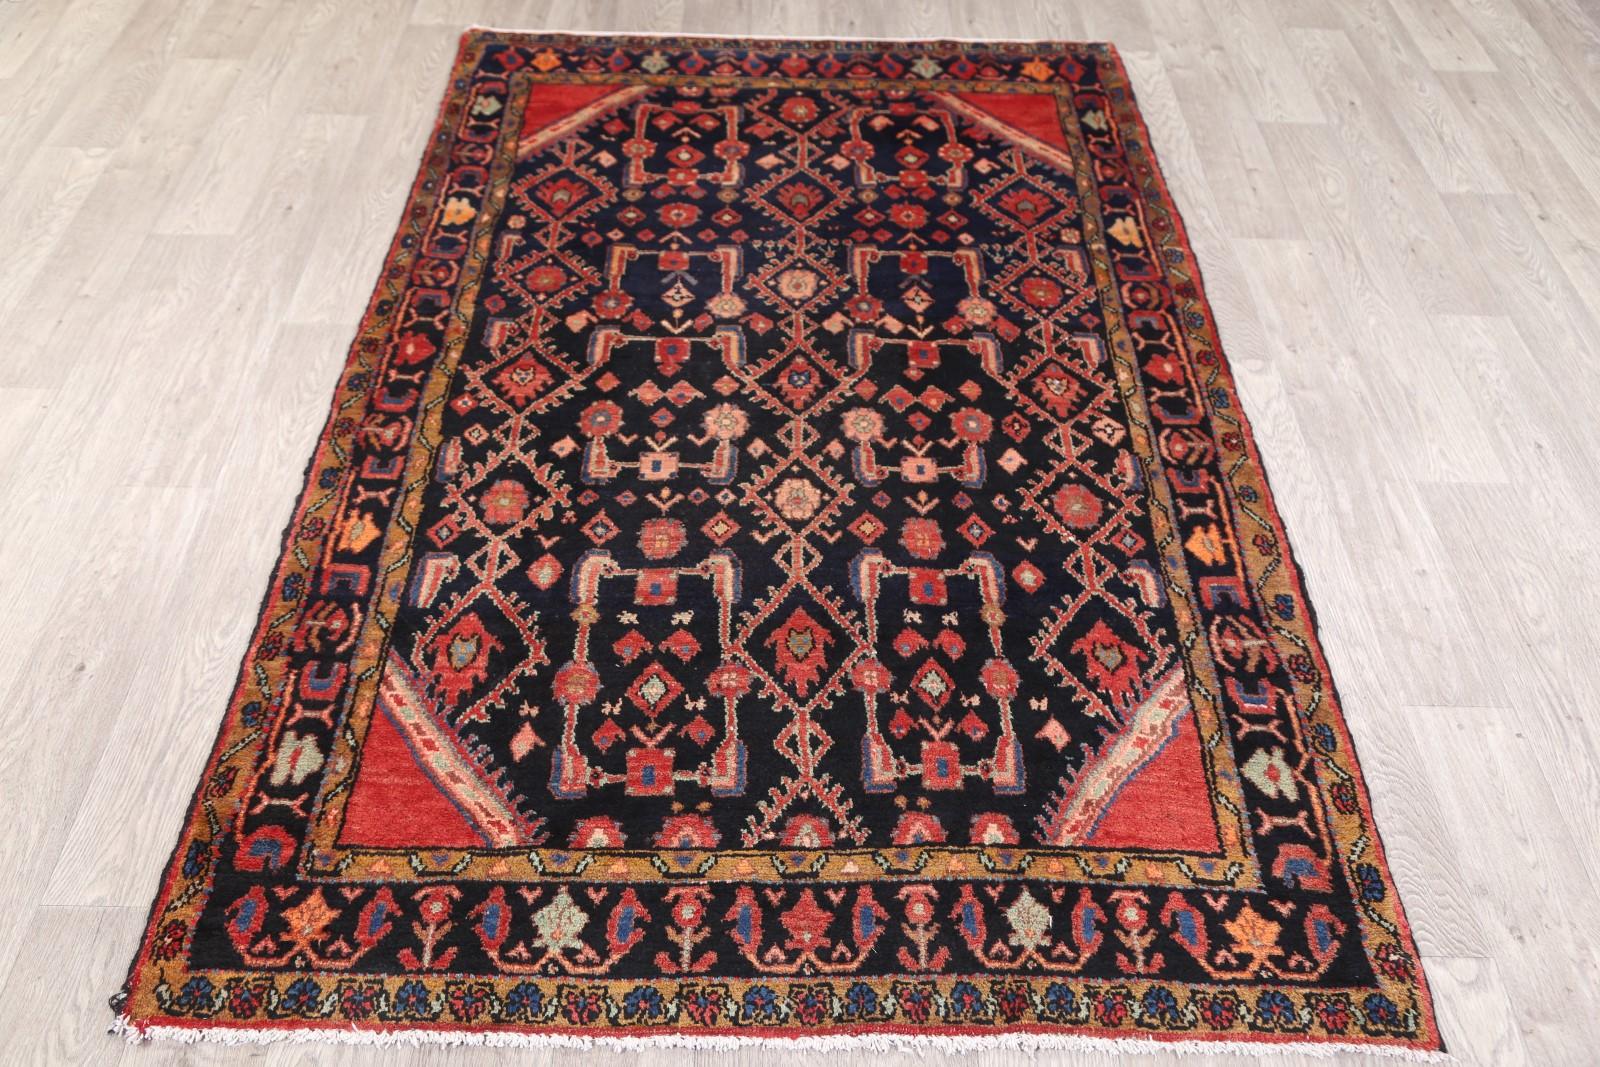 Spectacular Geometric 4x7 Wool Nahavand Hamedan Persian